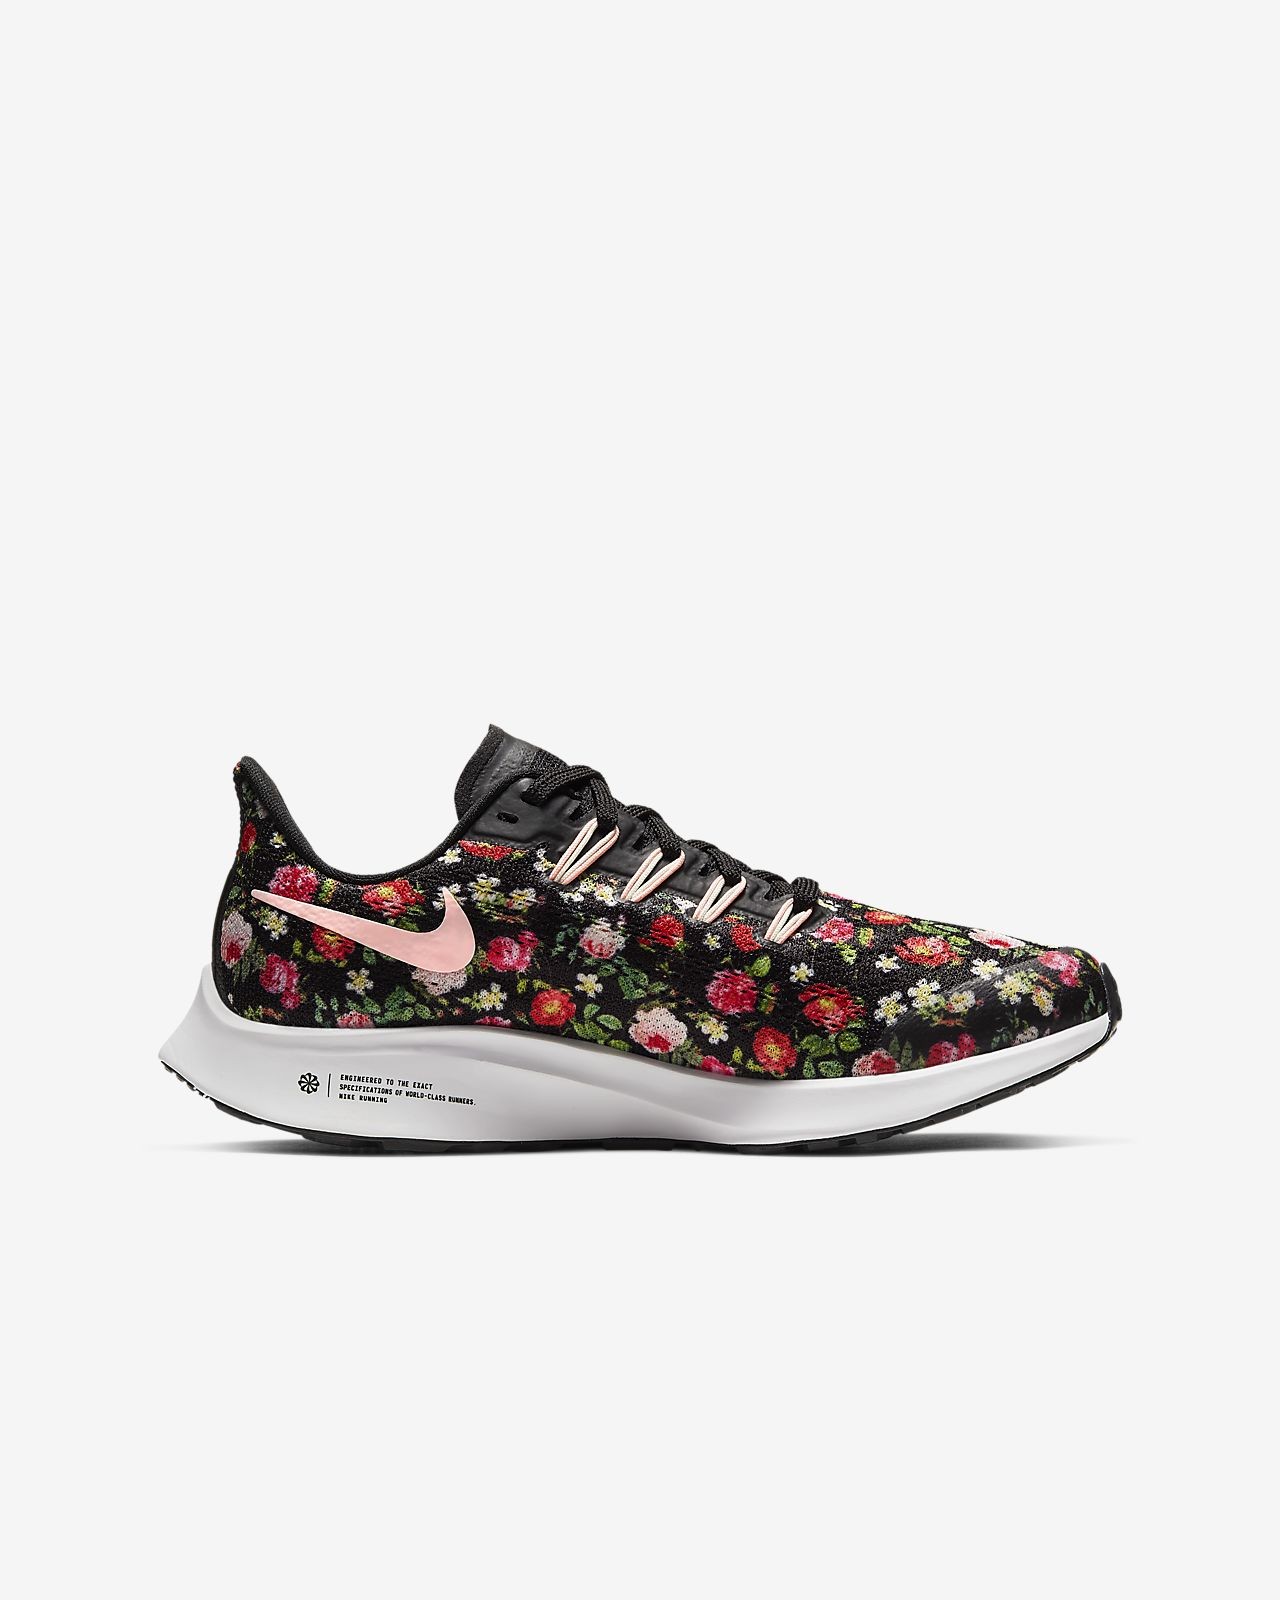 Chaussures Nike Air Max 95 Essential Prix Homme Pas Cher NoirBleuRougeGris 749766 002 1810100858 Les Nike Magasins Discount D´usine,Nike